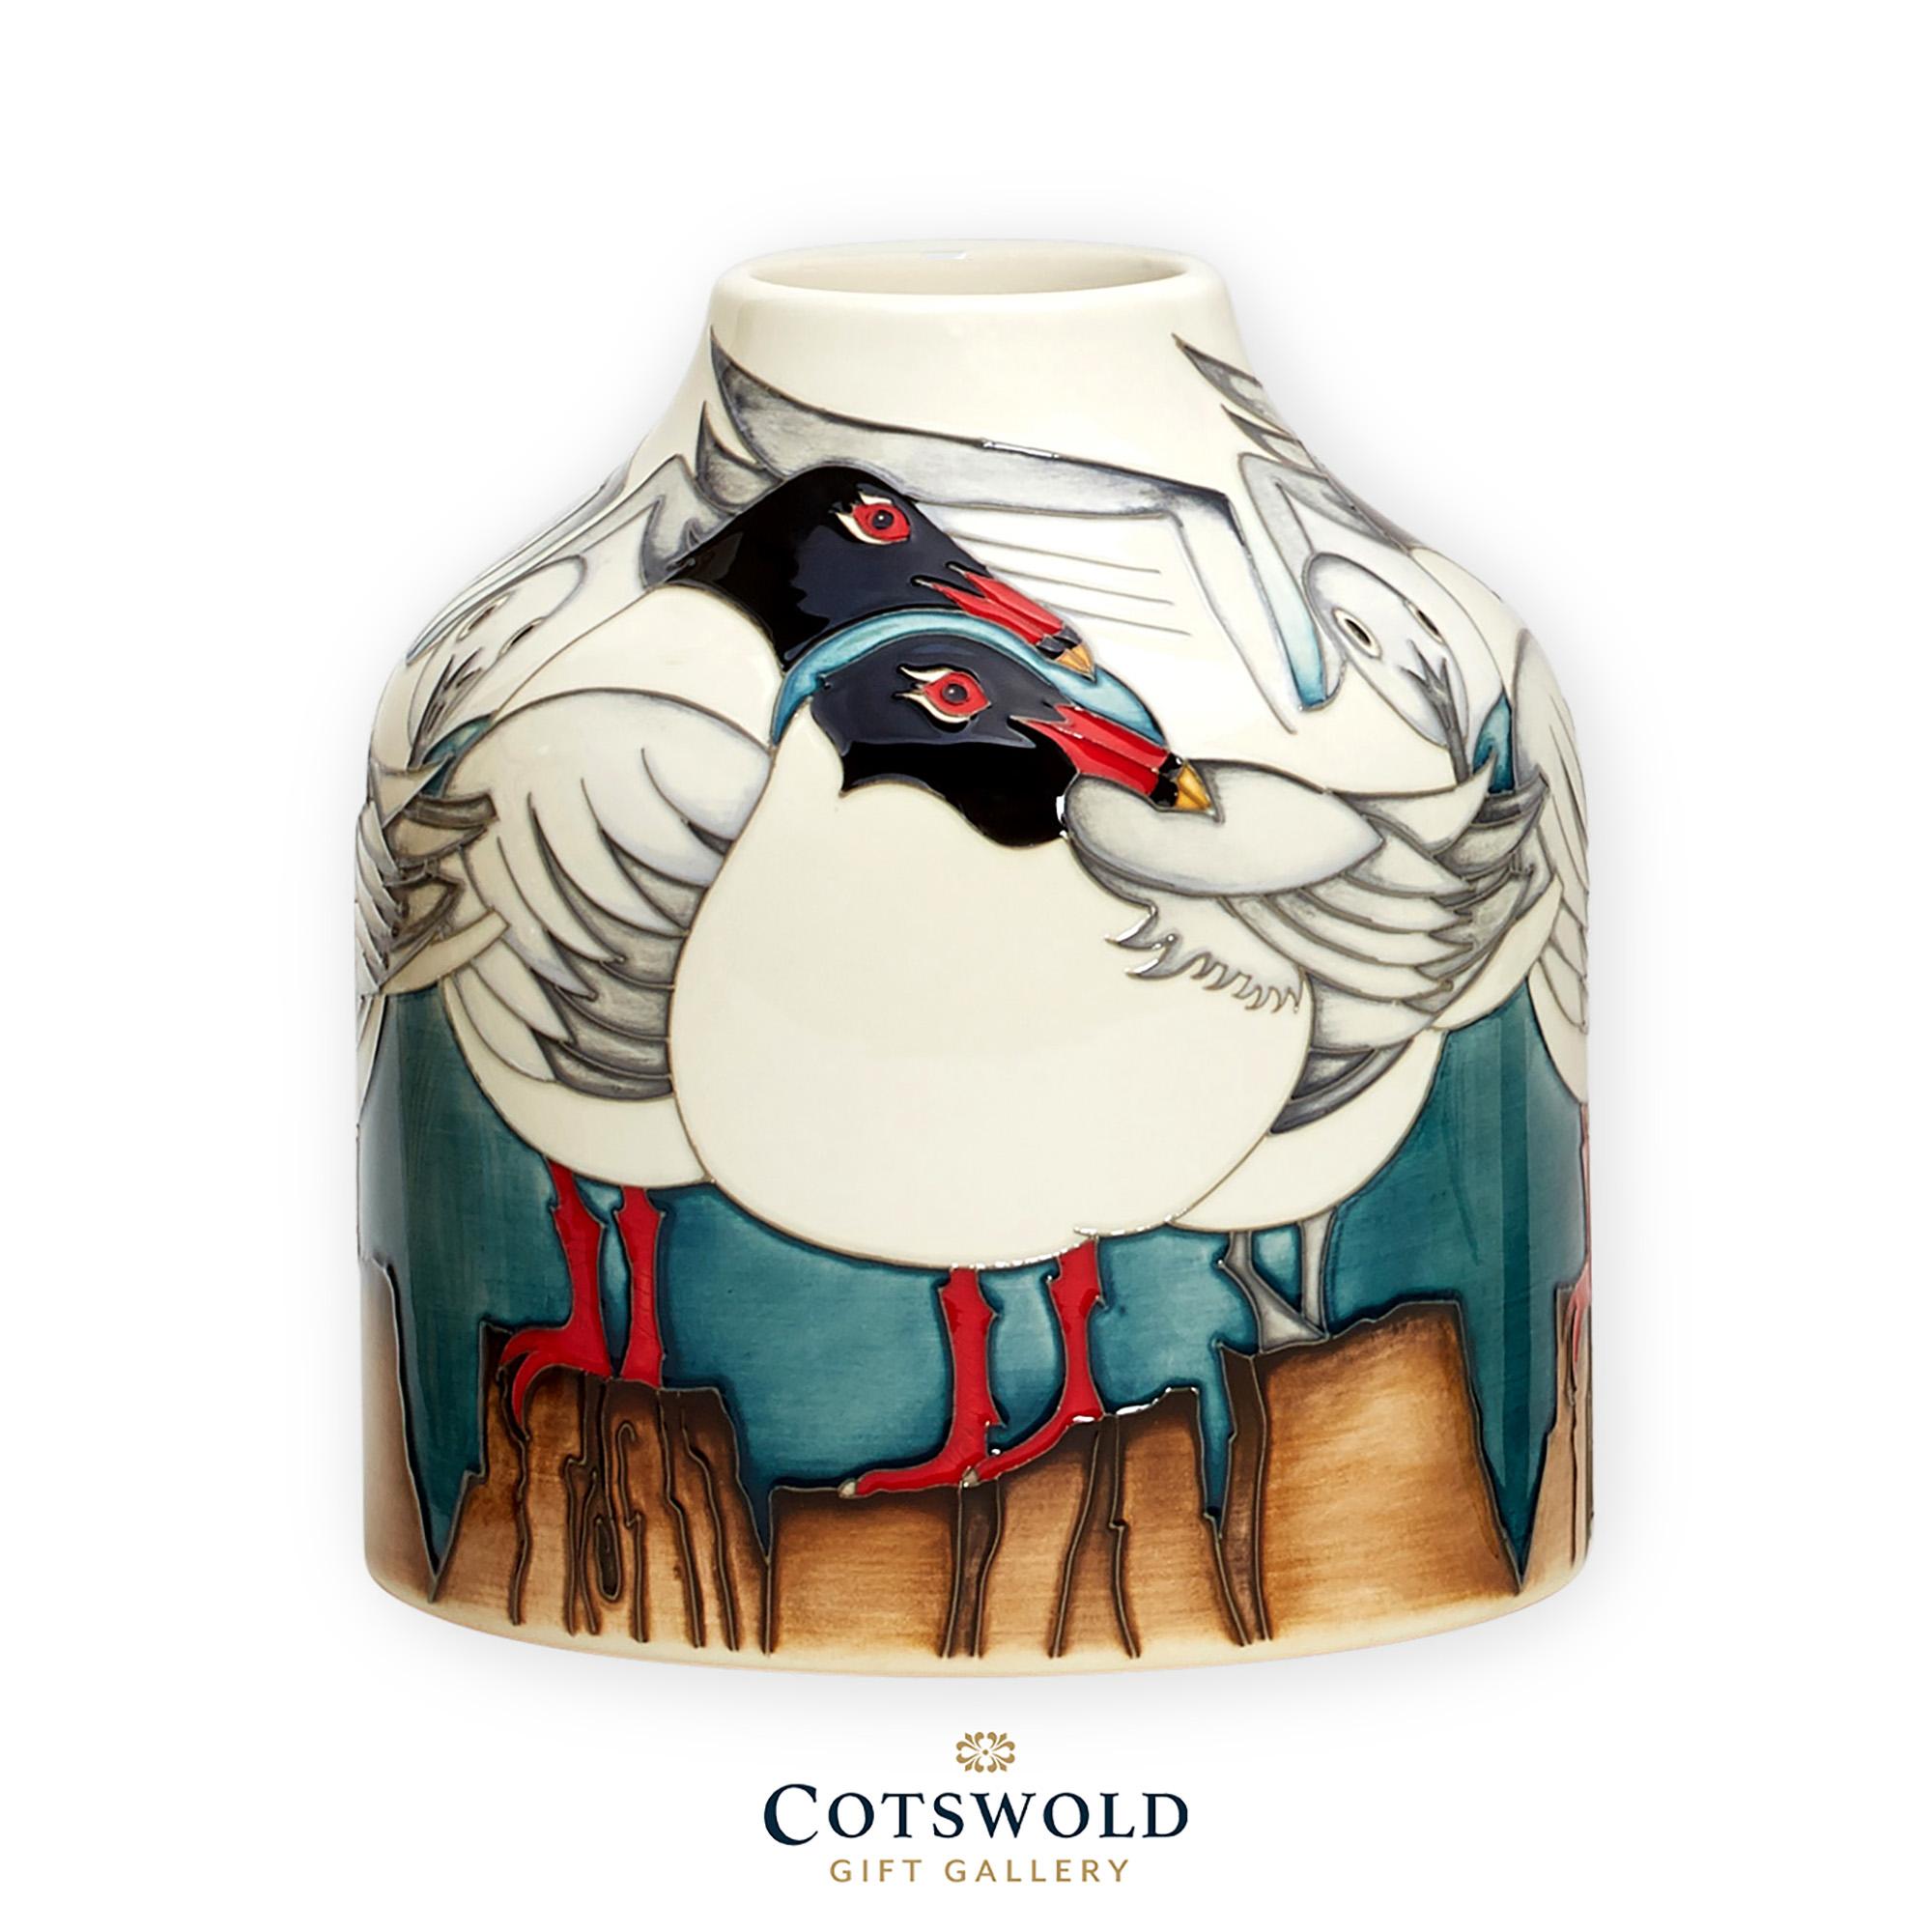 Moorcroft Pottery Mediterranean Gulls Vase